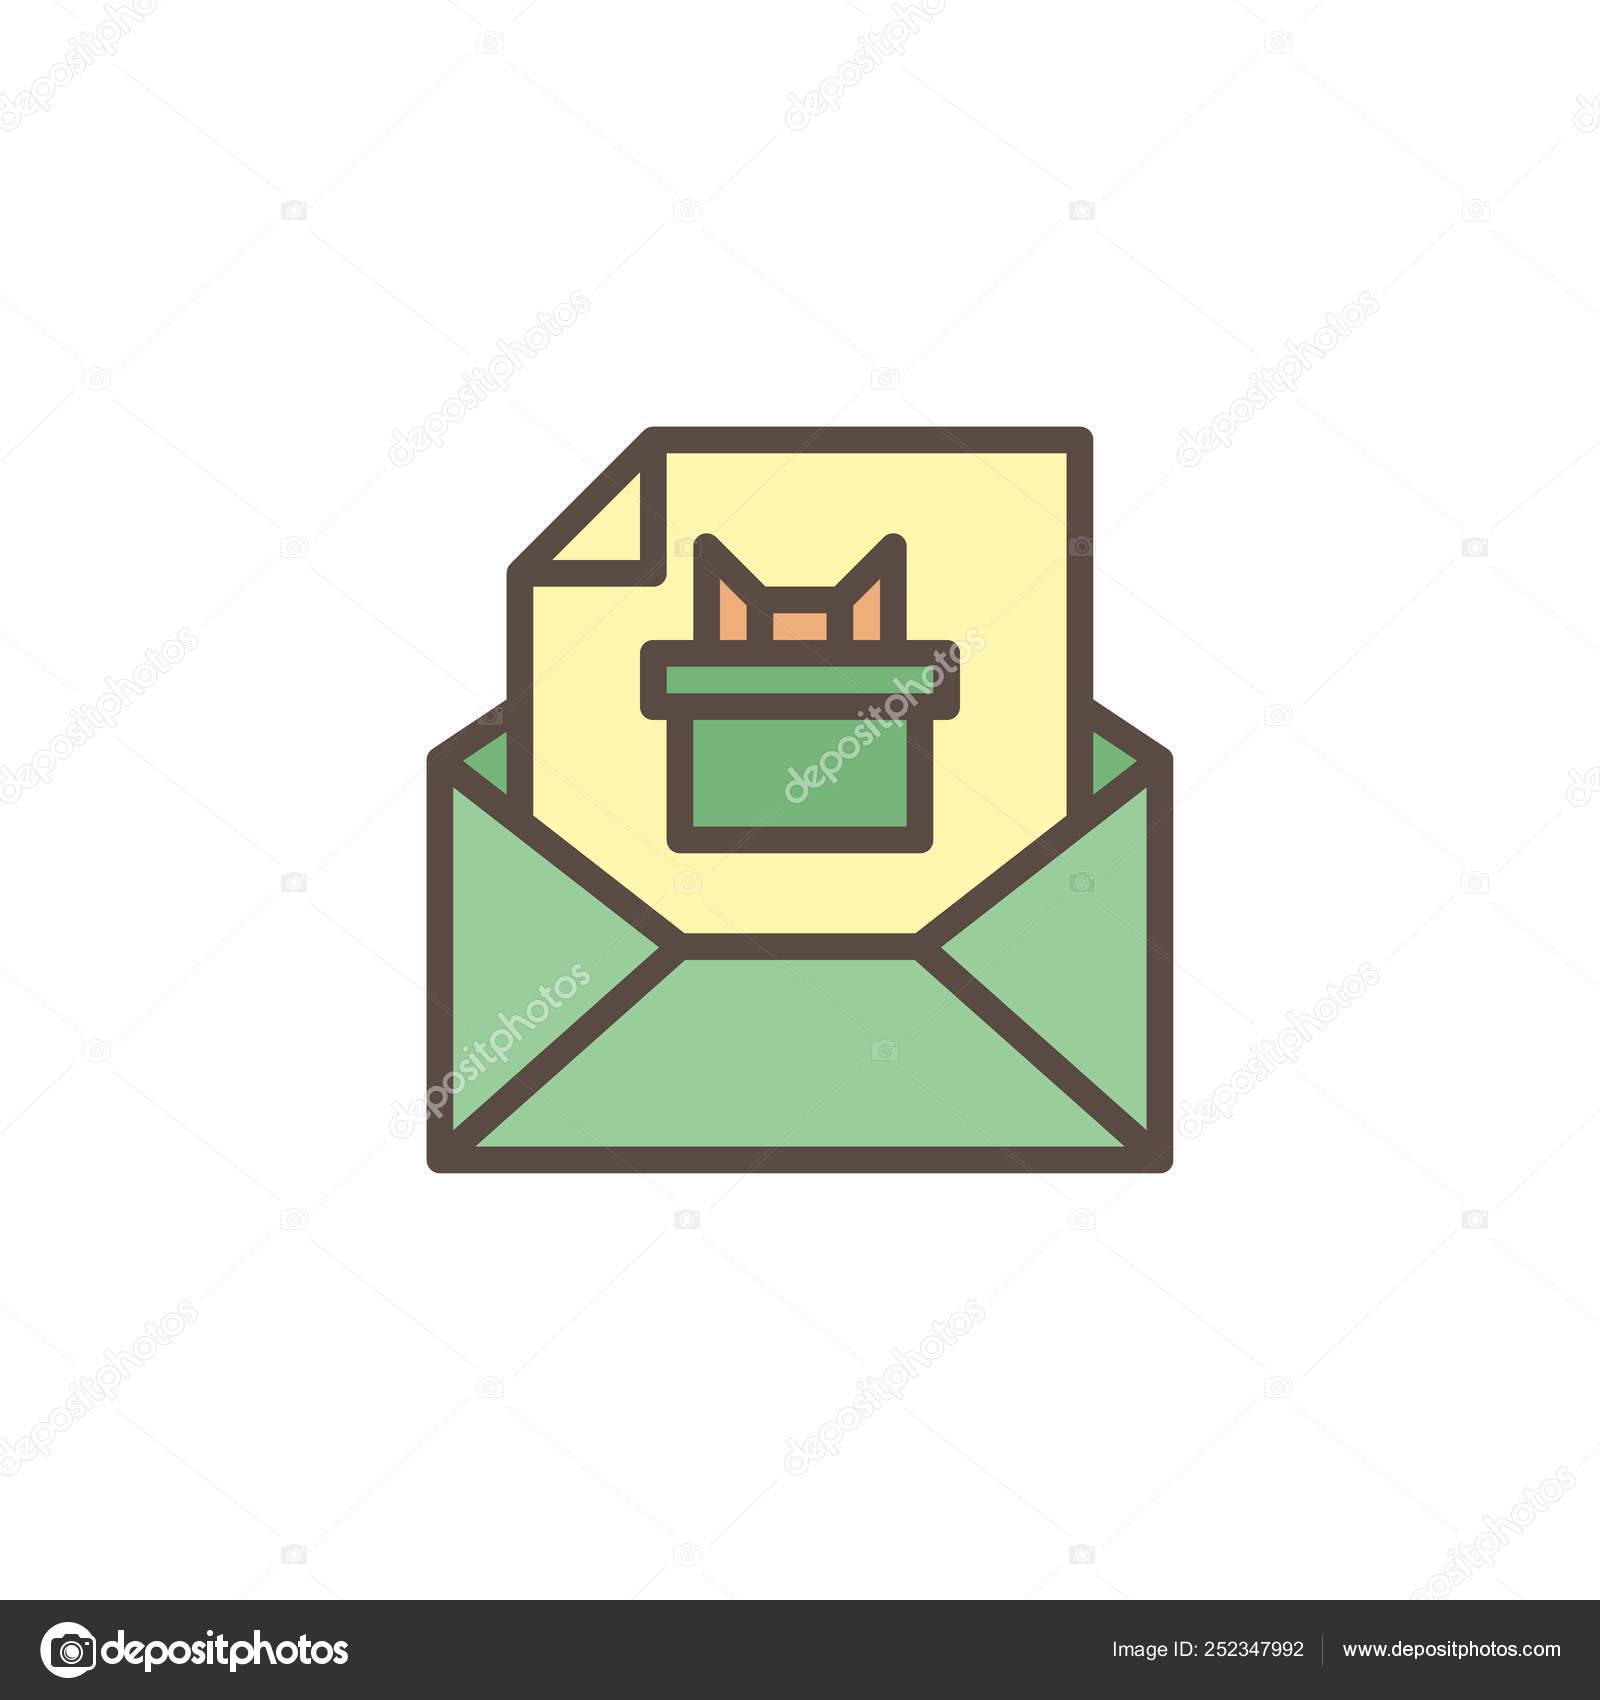 https depositphotos com 252347992 stock illustration envelope with invitation card filled html